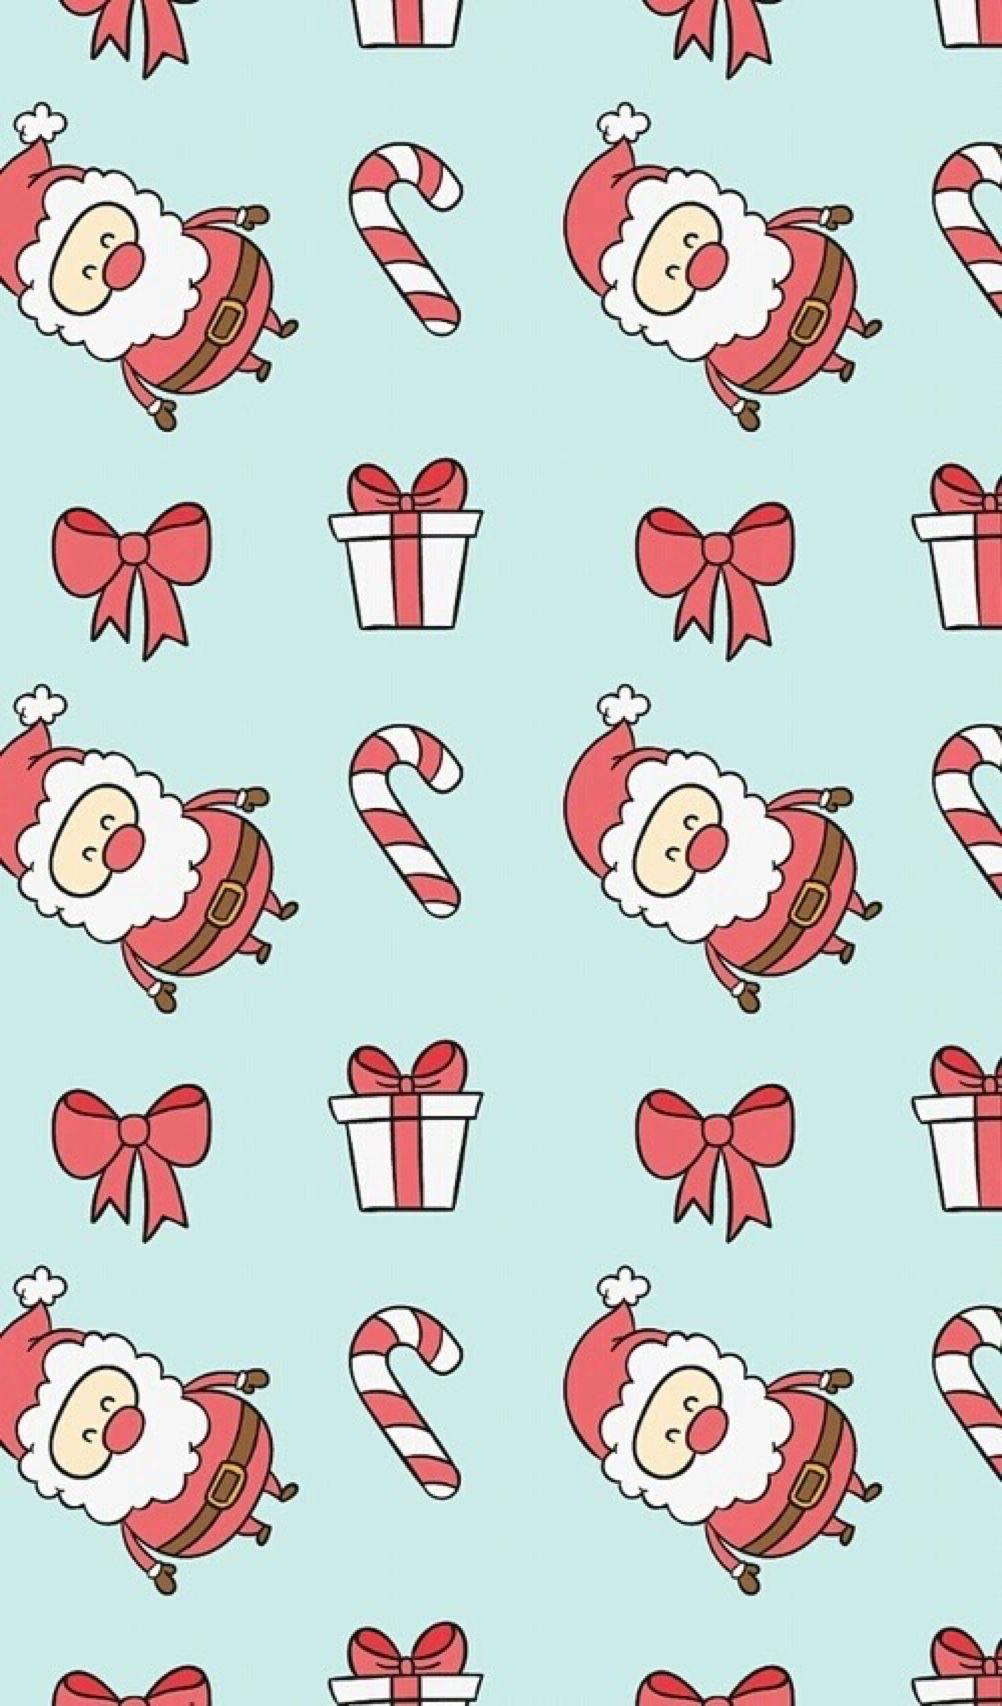 Winter Wallpaper Tumblr Christmas Phone Wallpaper Cute Christmas Wallpaper Wallpaper Iphone Christmas